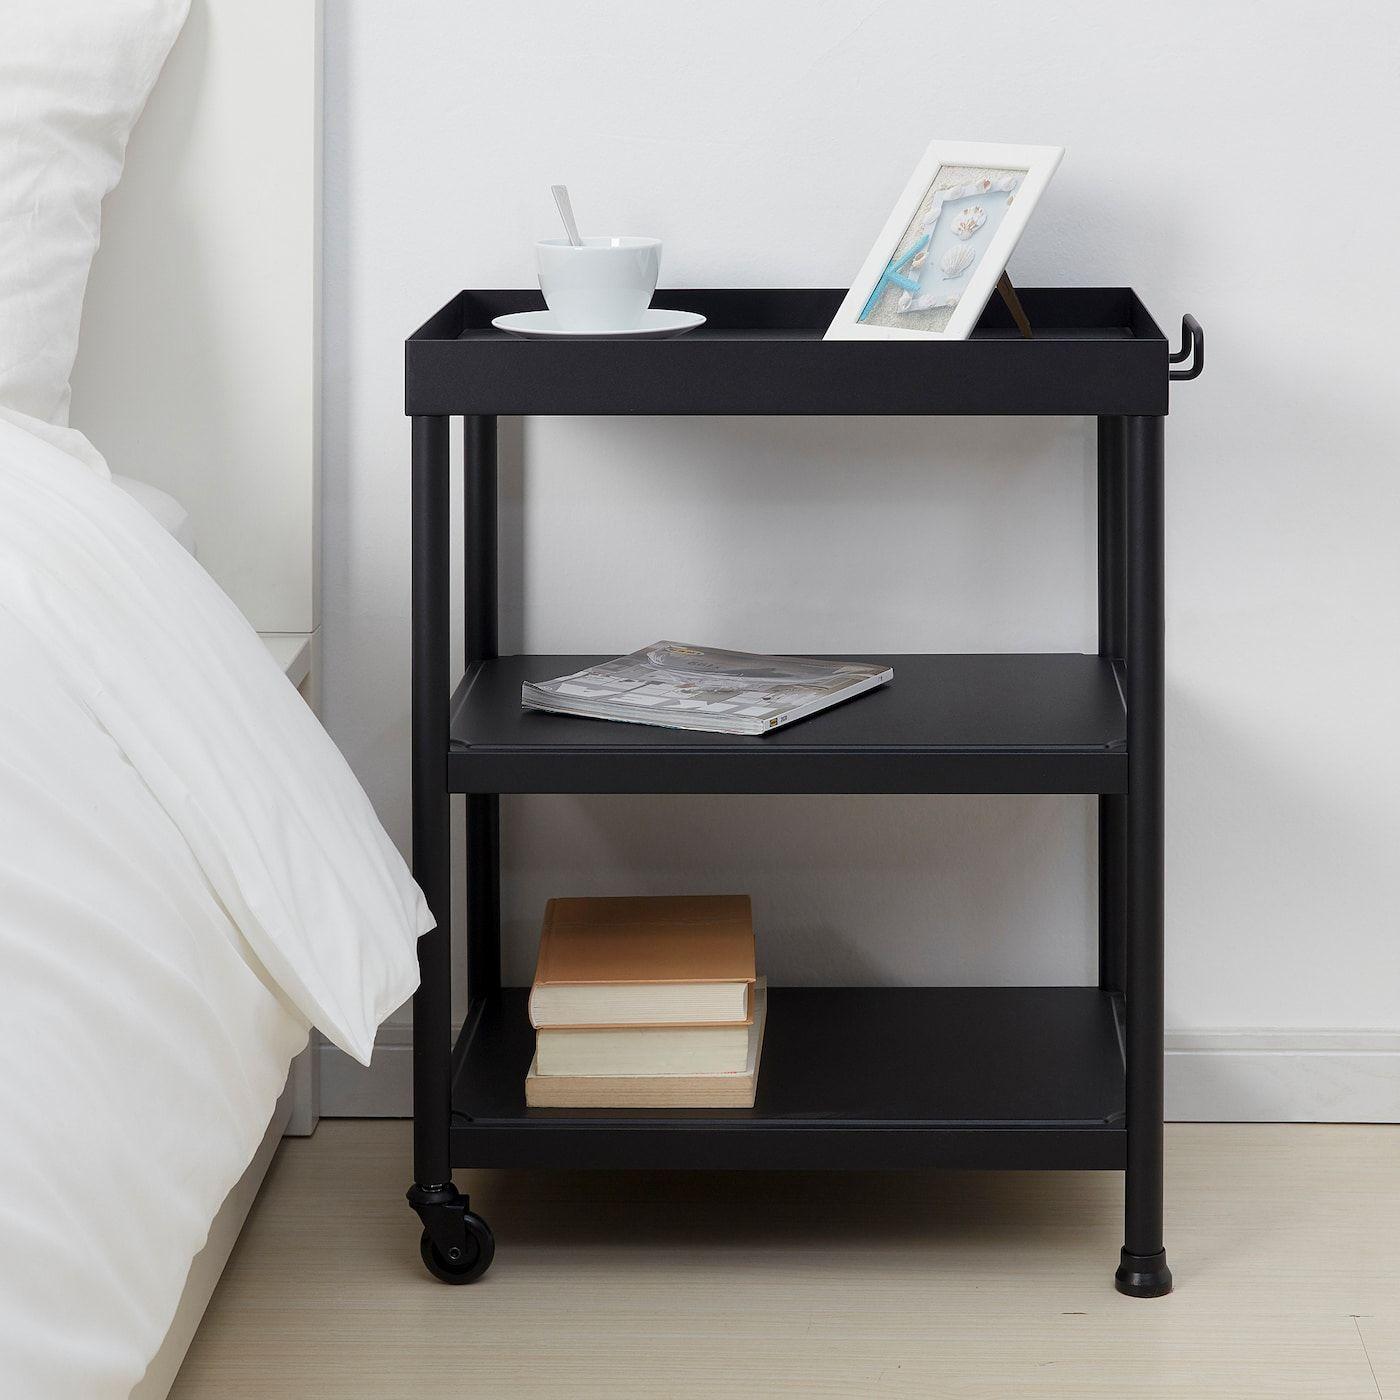 Kornsjo Side Table Black 195 8x133 4 50x35 Cm Ikea Black Side Table Side Table Side Tables Bedroom [ 1400 x 1400 Pixel ]